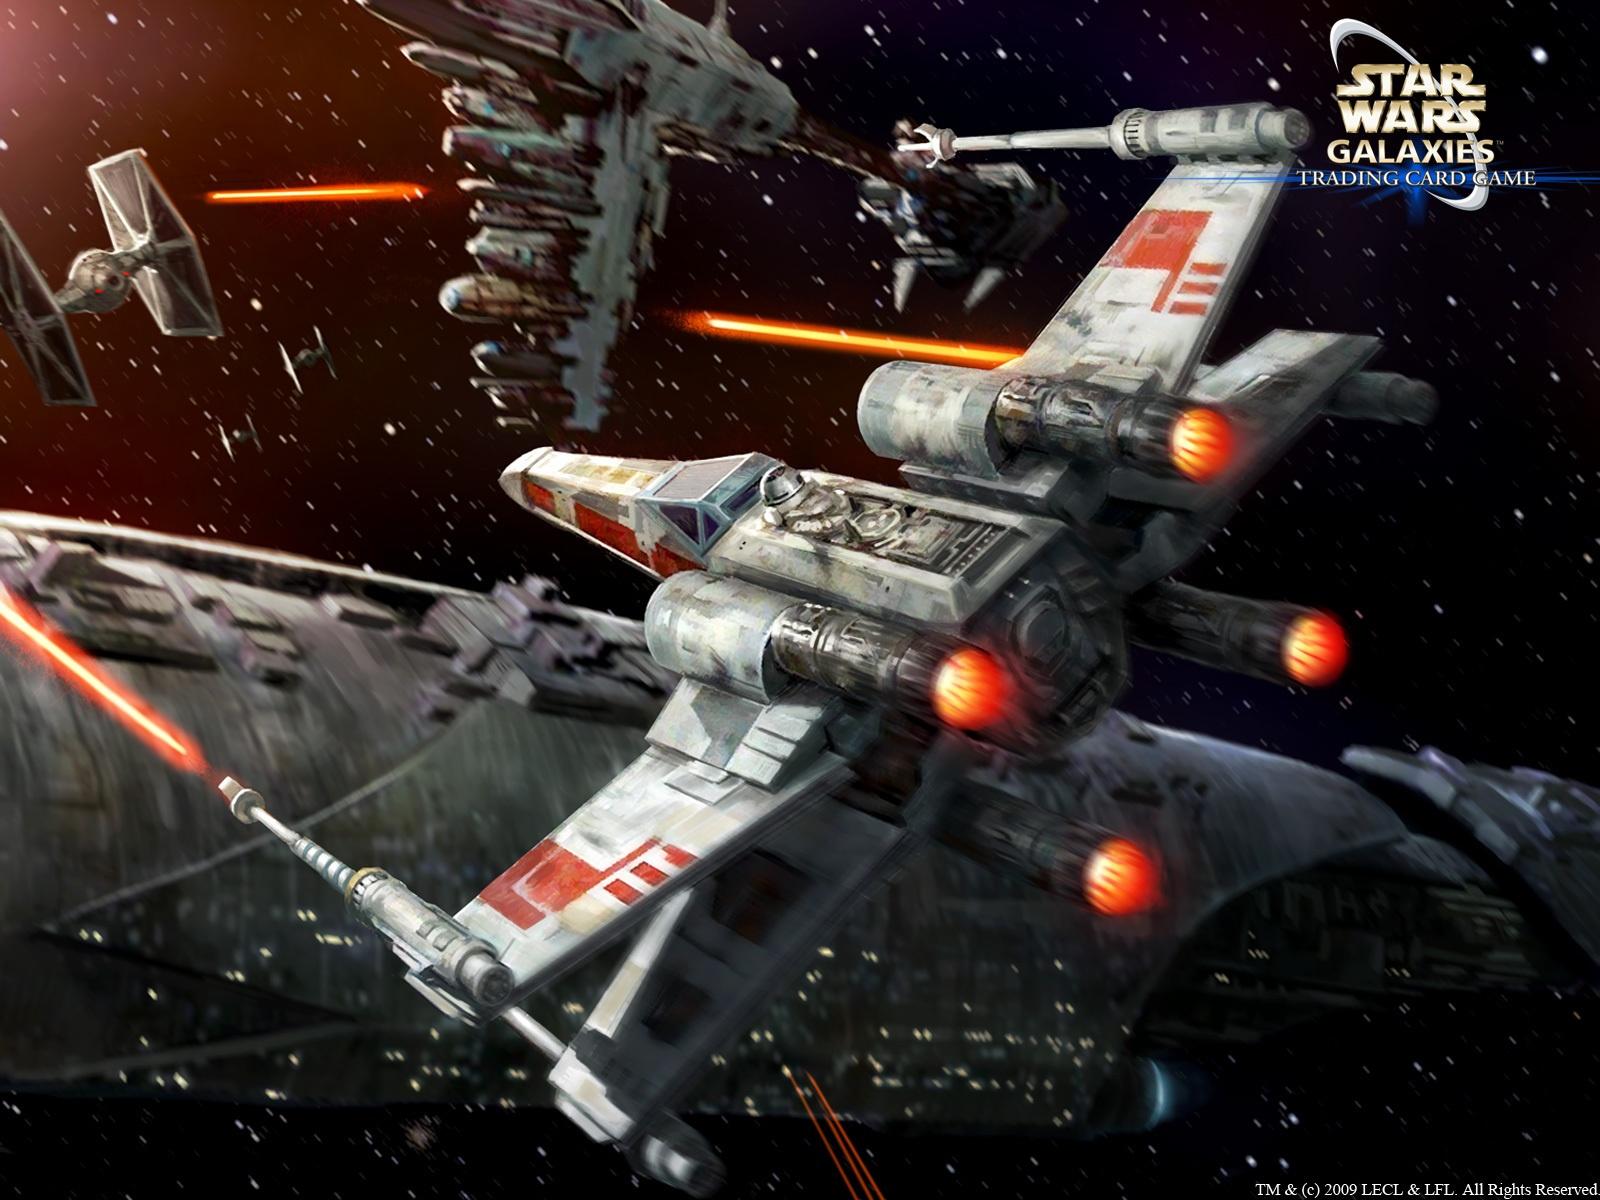 kino zvezdnye vojny star wars 8321 - Детский день рождения